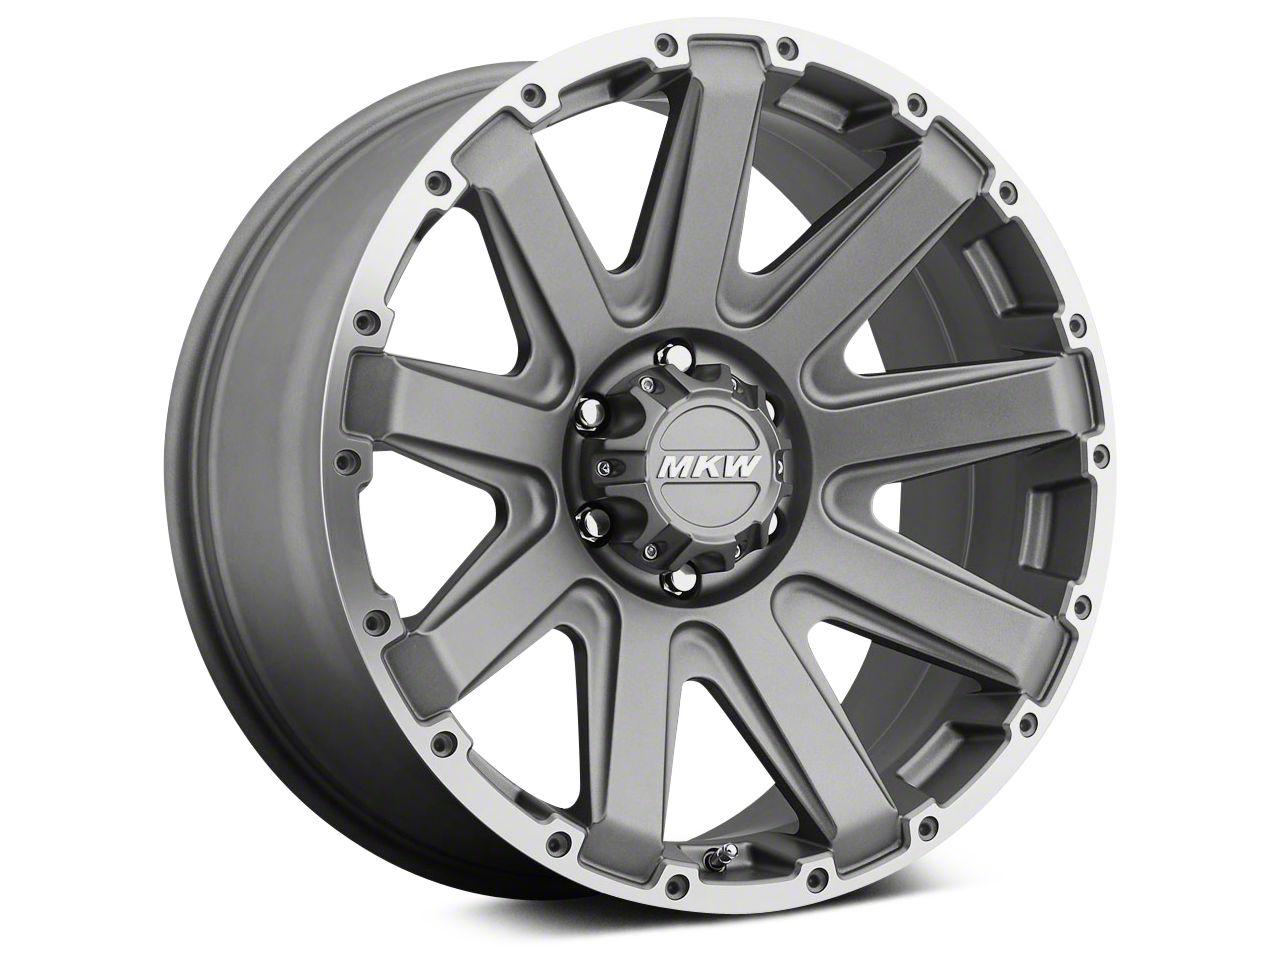 MKW Offroad M94 Gray w/ Machined Ring Wheel - 18x9 (07-18 Jeep Wrangler JK; 2018 Jeep Wrangler JL)